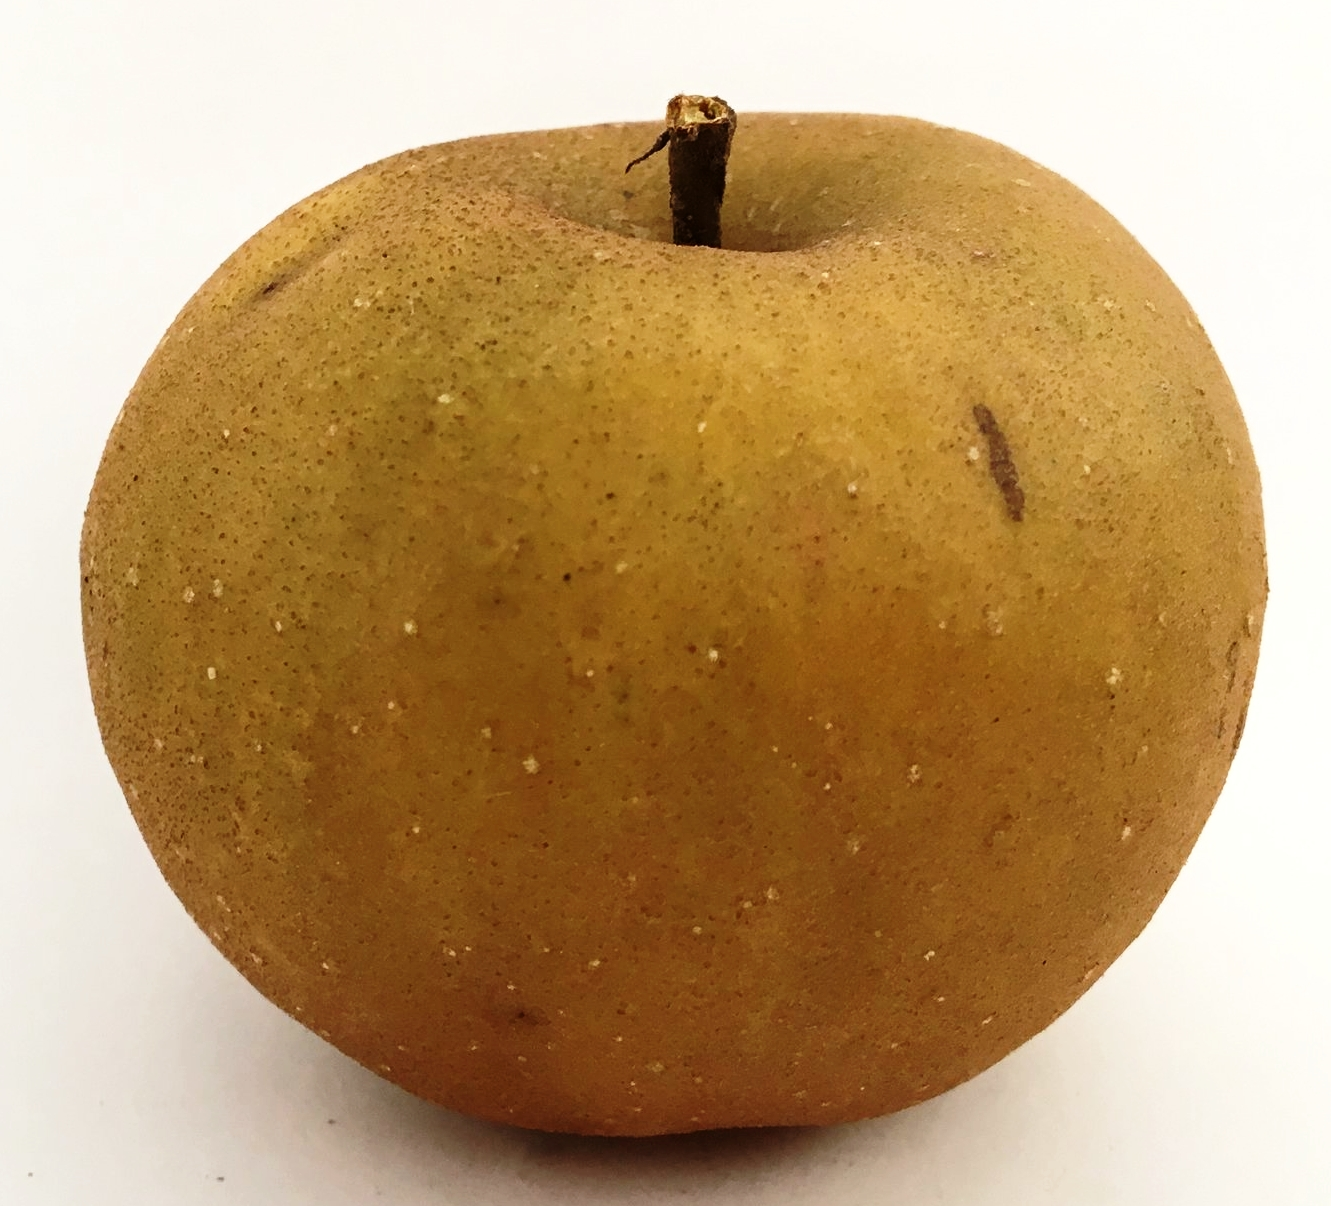 Slippery Cider Apple